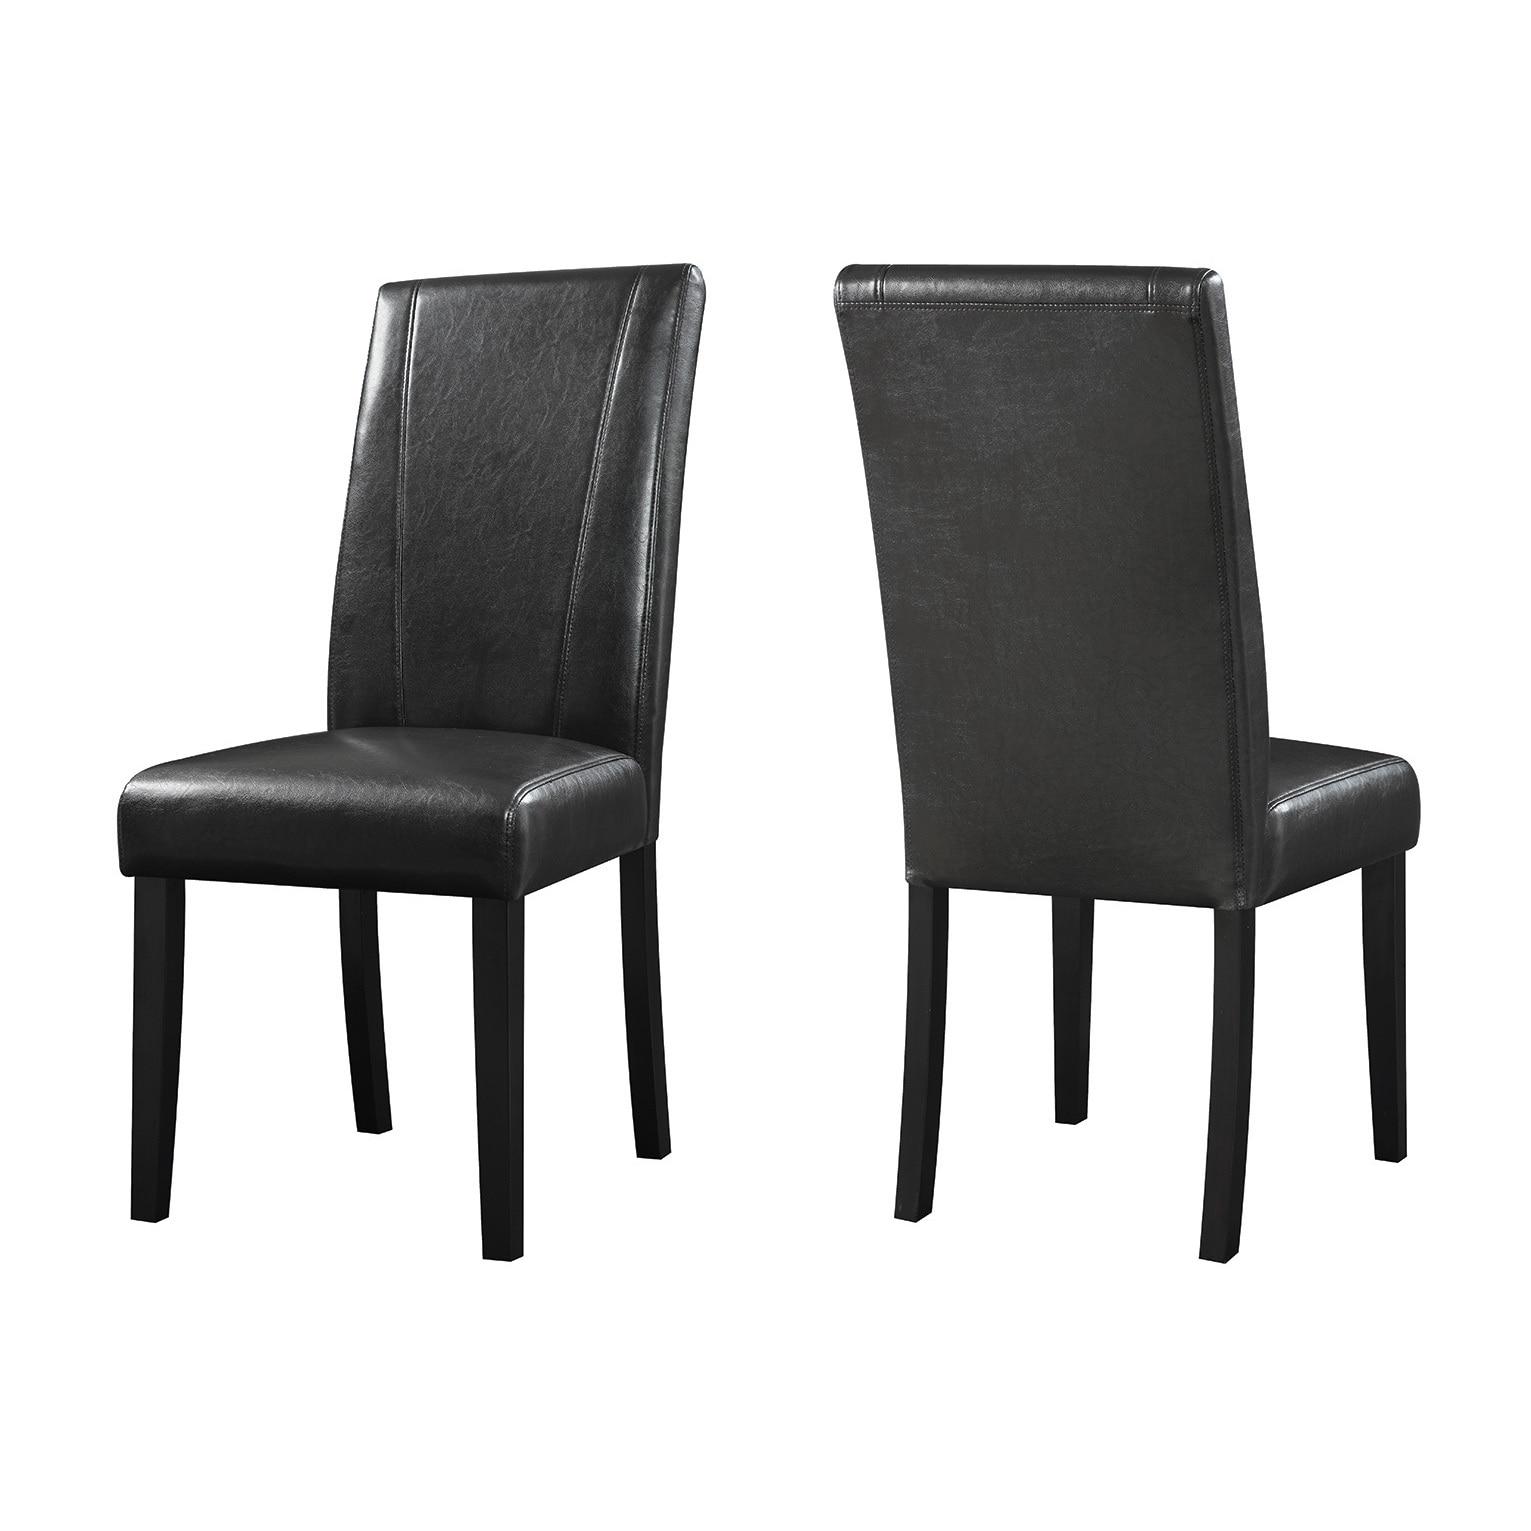 Coaster Company Brown Parson Chairs (Set of 2) - 18.25 x 24.50 x 39.50 (PARSON CHAIR)